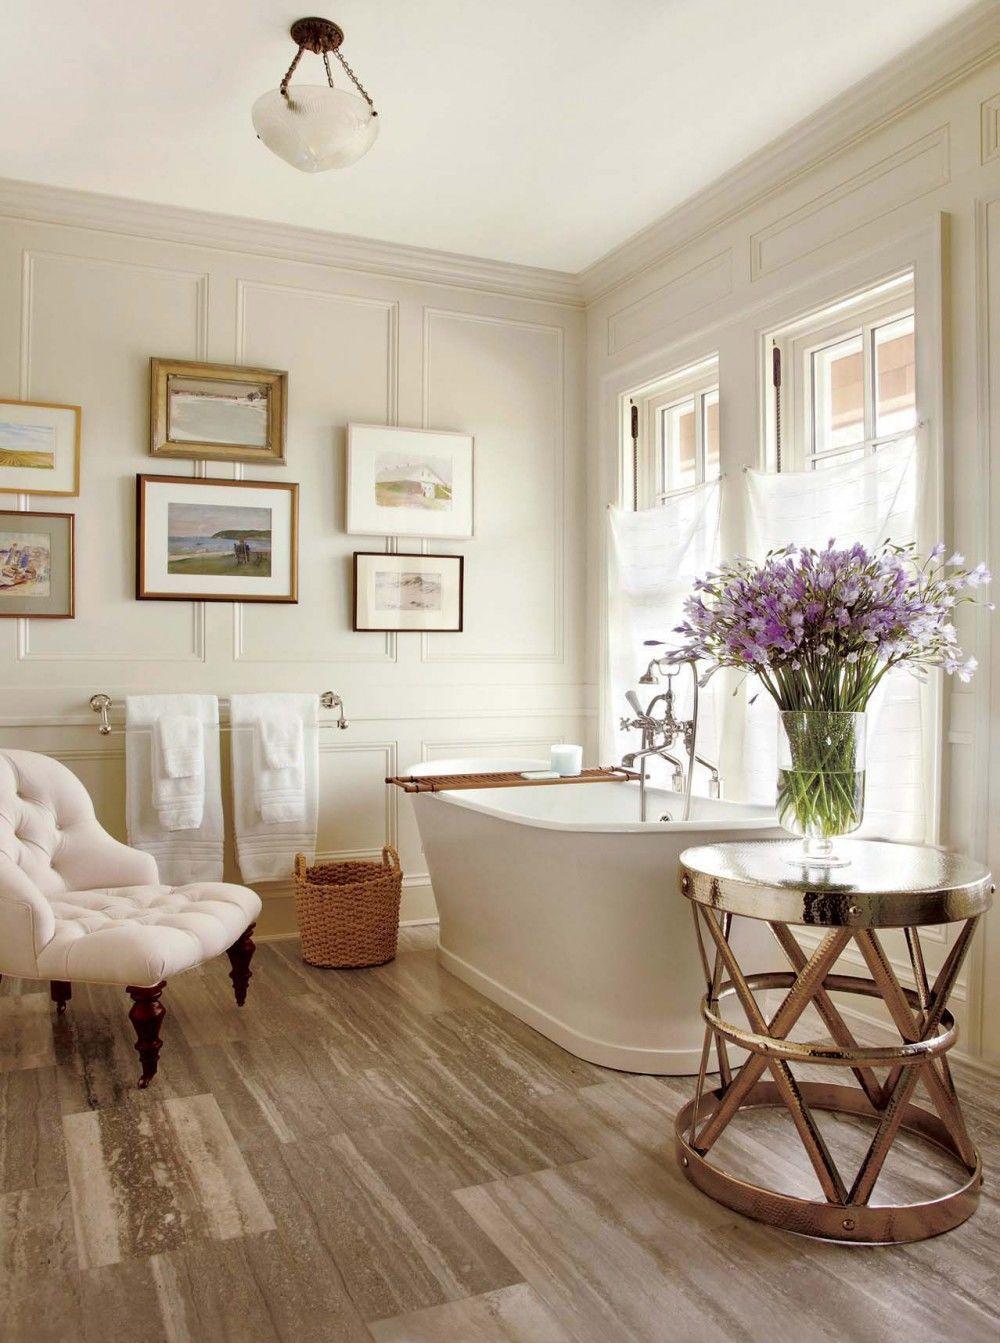 Traditional bathroom decor ideas | a master bath by Carrier and ...